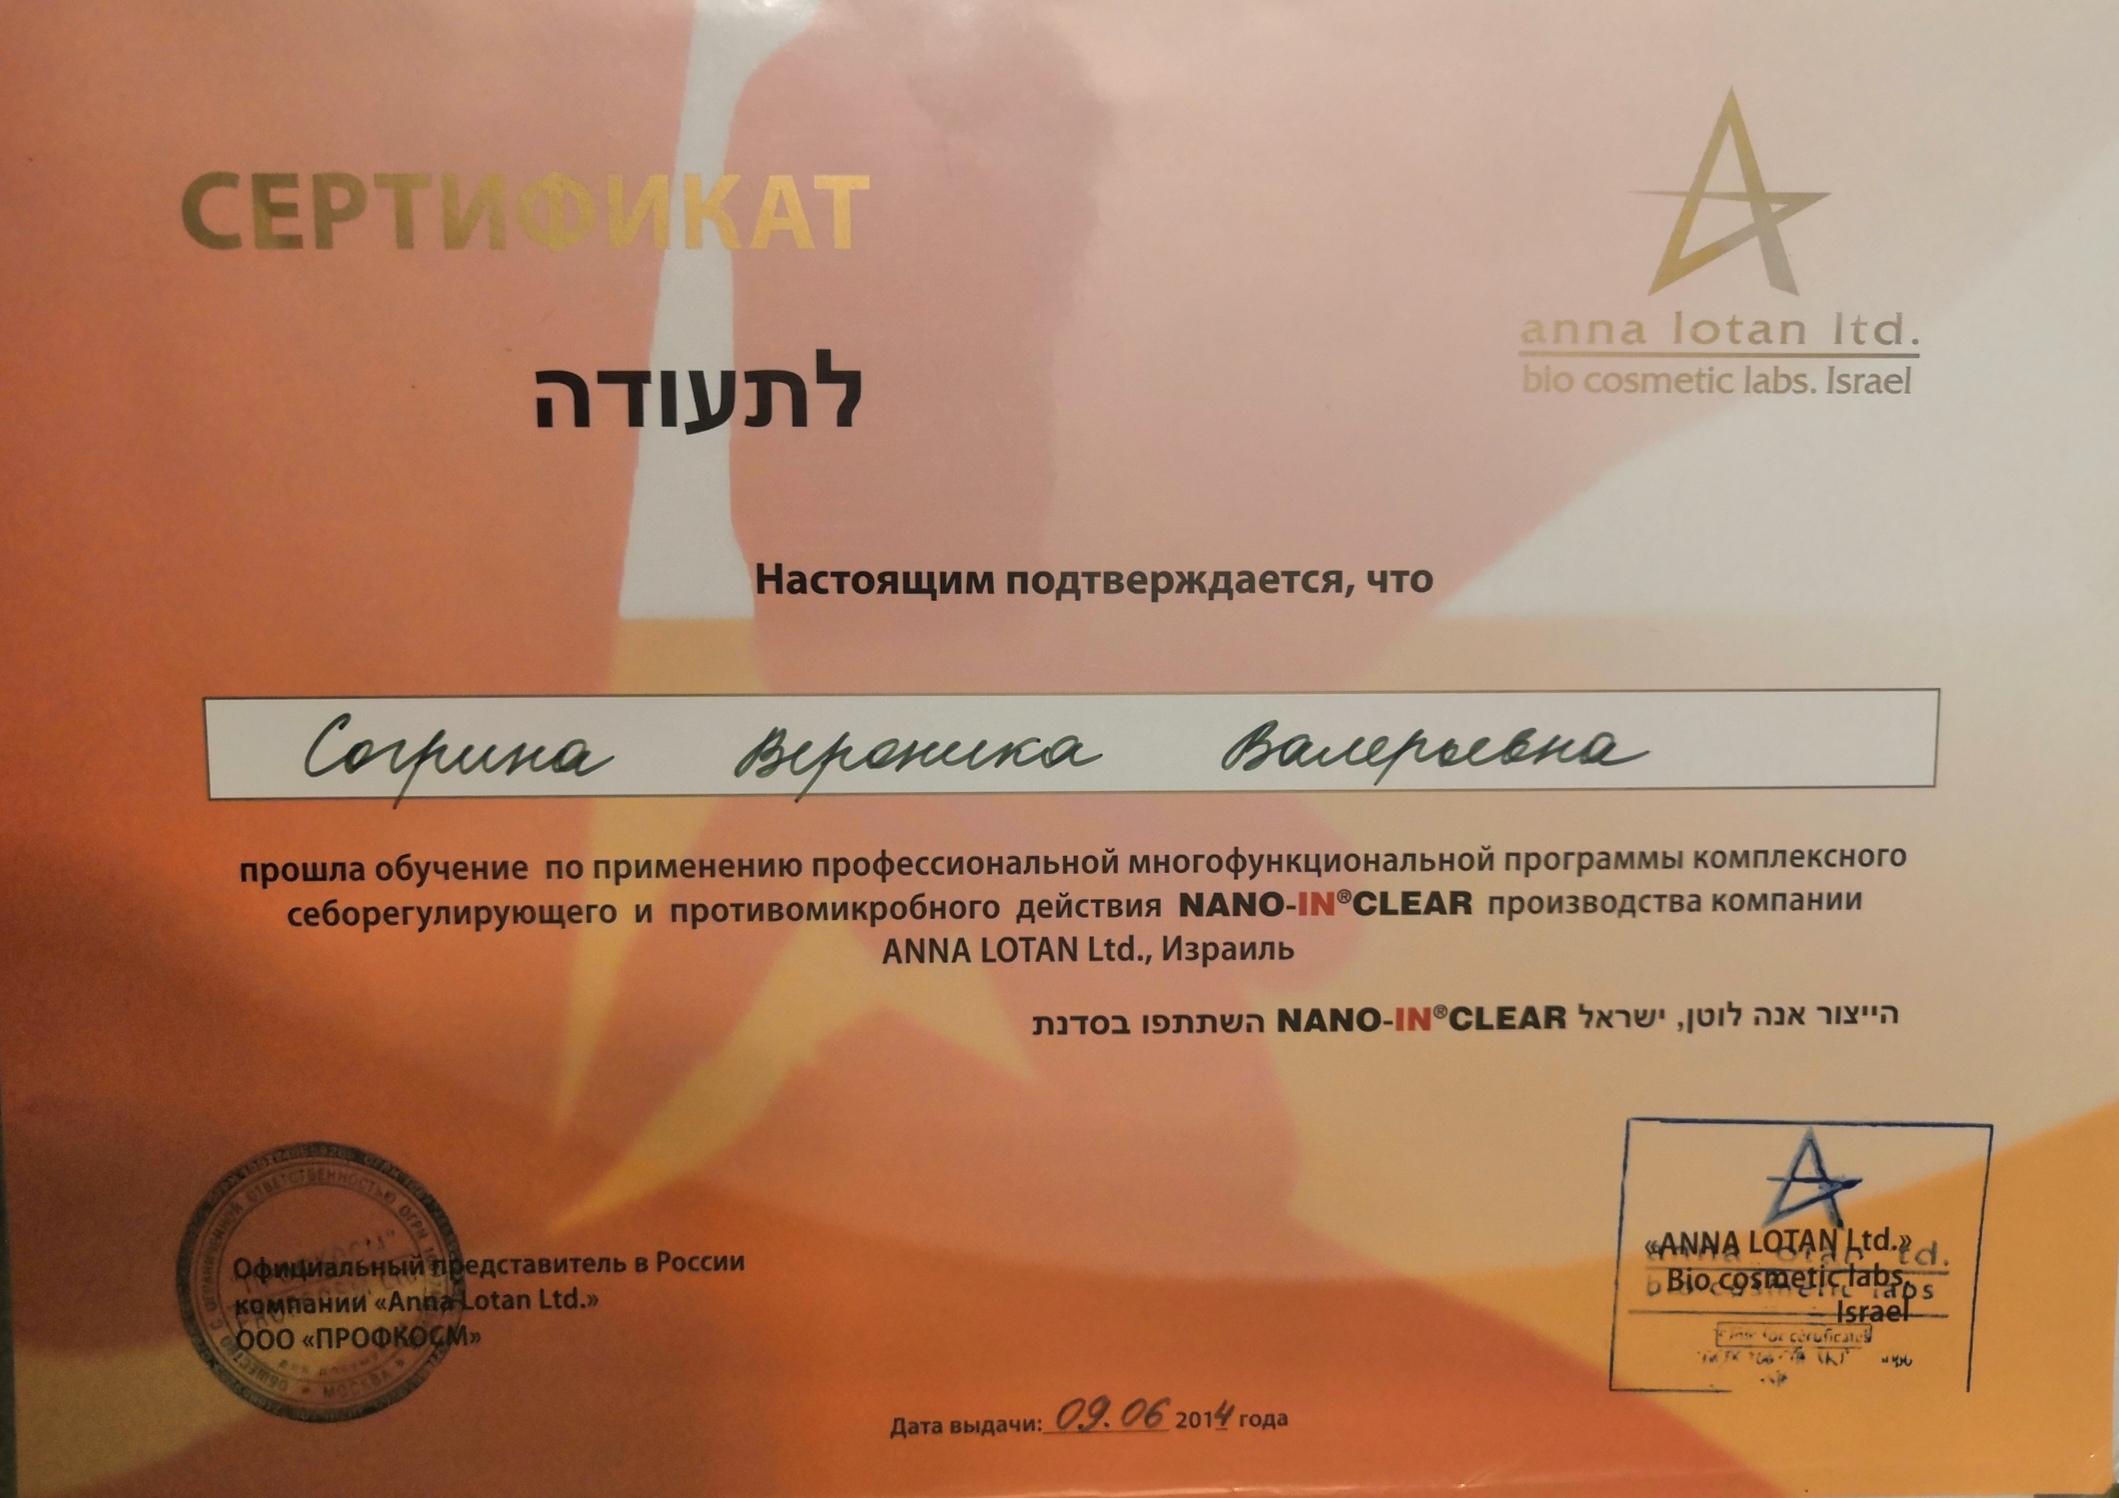 2014, Anna Lotan Ltd., программа комплексного действия NANO-IN CLEAR